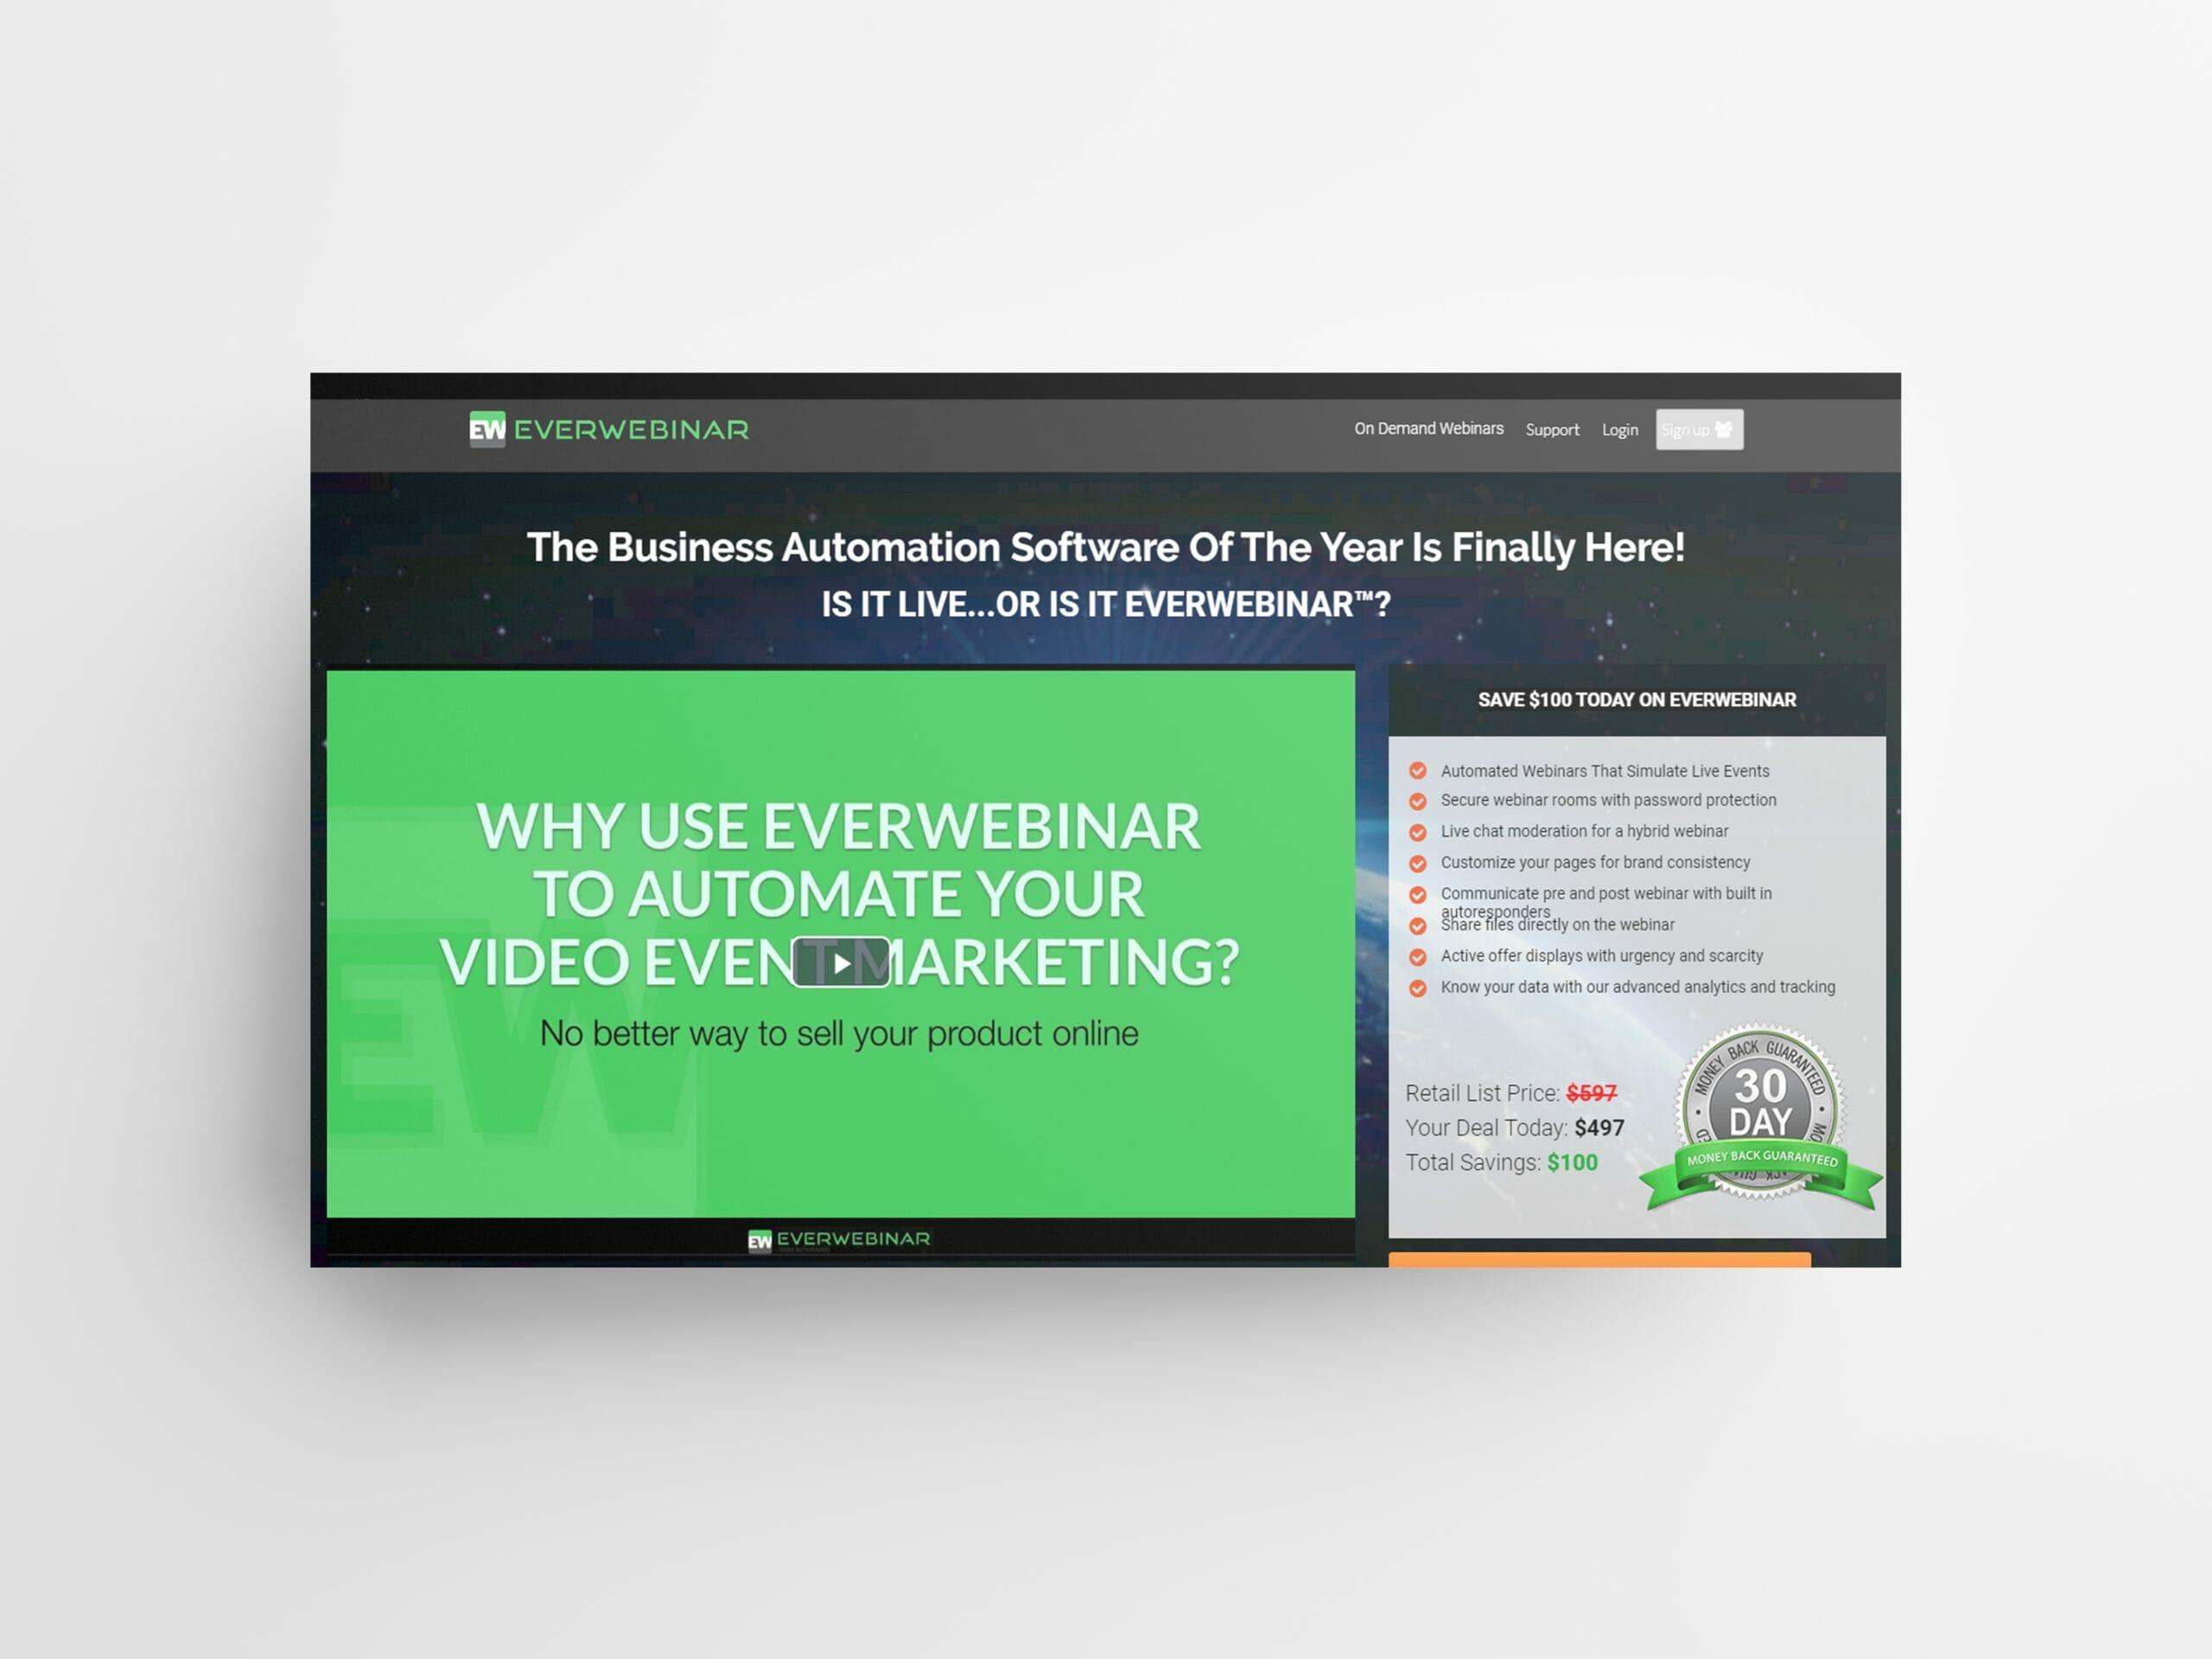 everwebiner for Webinars